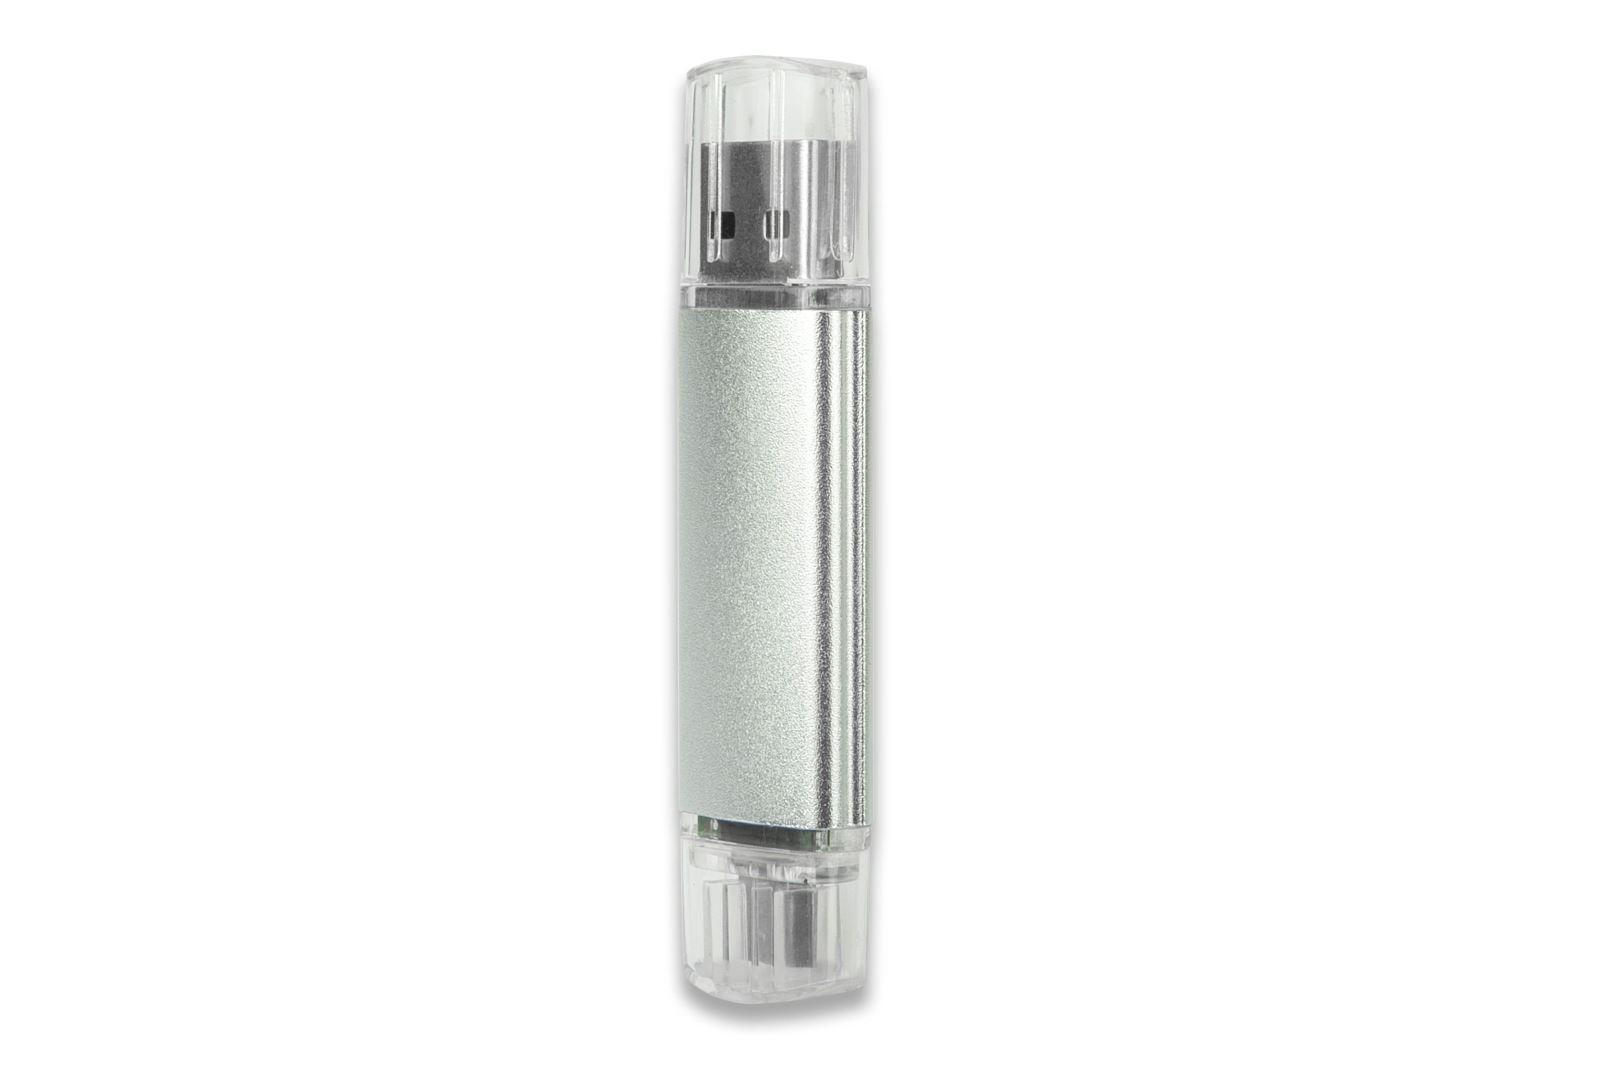 Cep Telefonu Uyumlu Flash Bellek 16 GB (OTG) Metalik